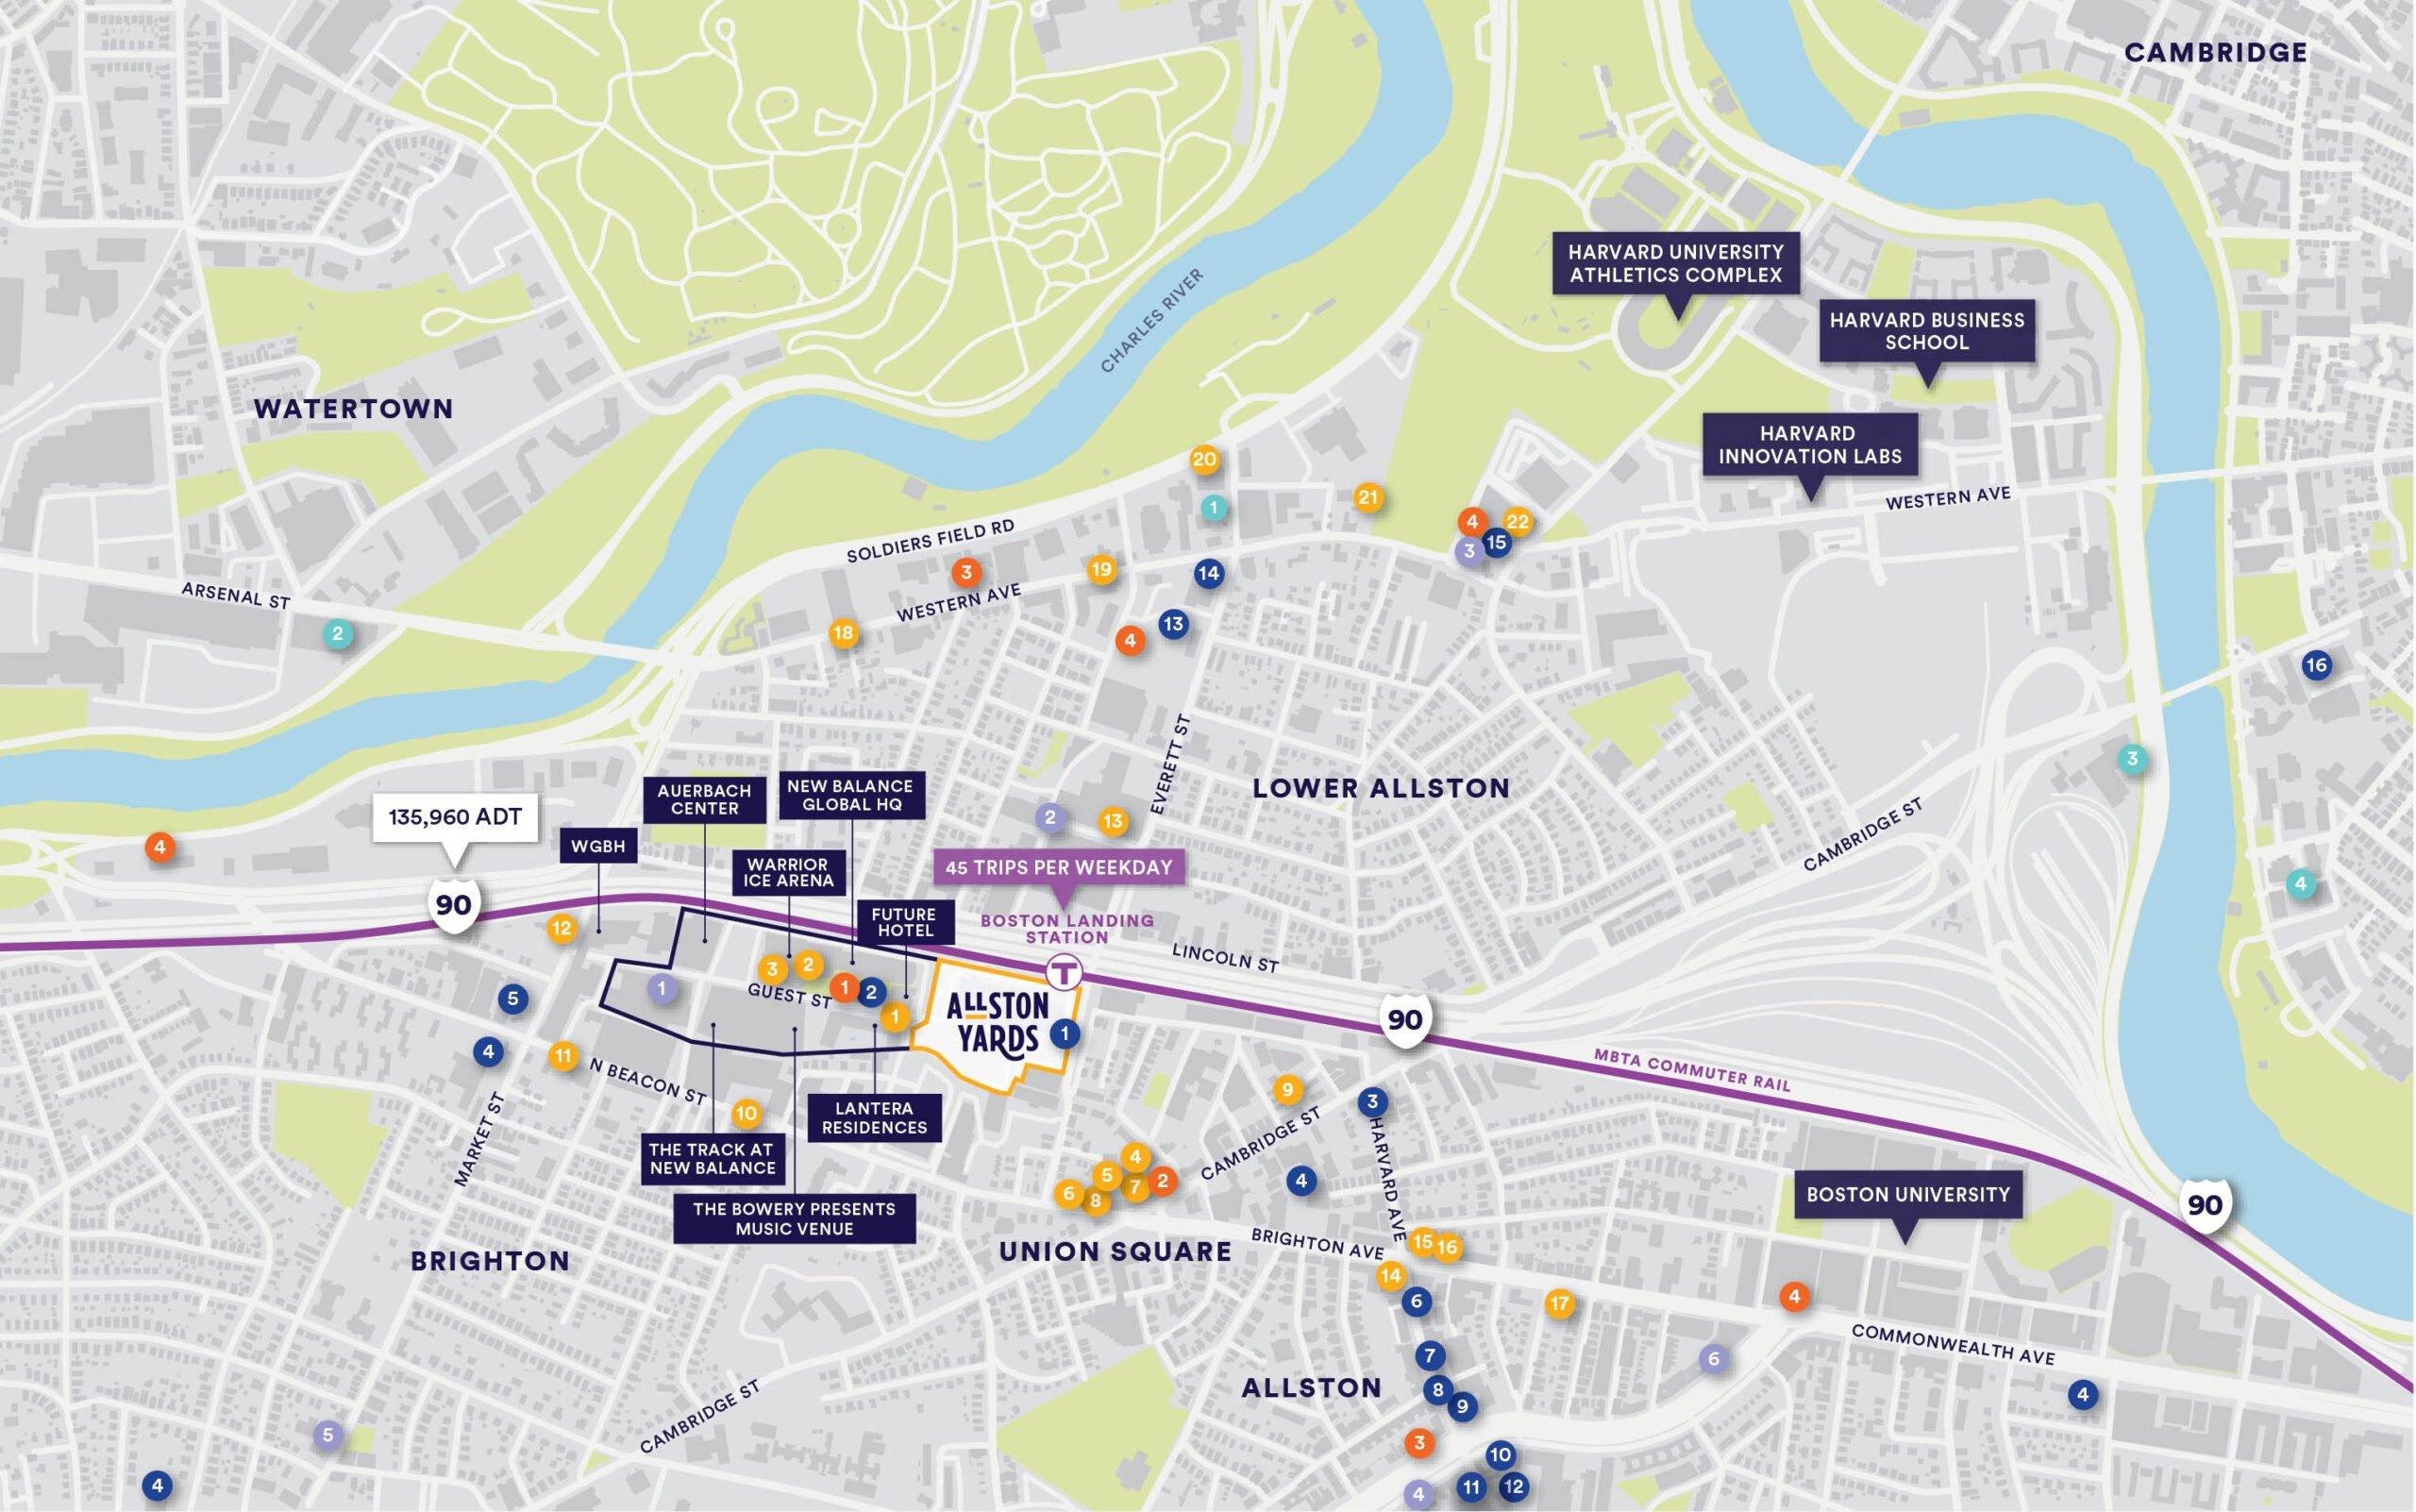 Allston Yards Locator Map - Area Amenities